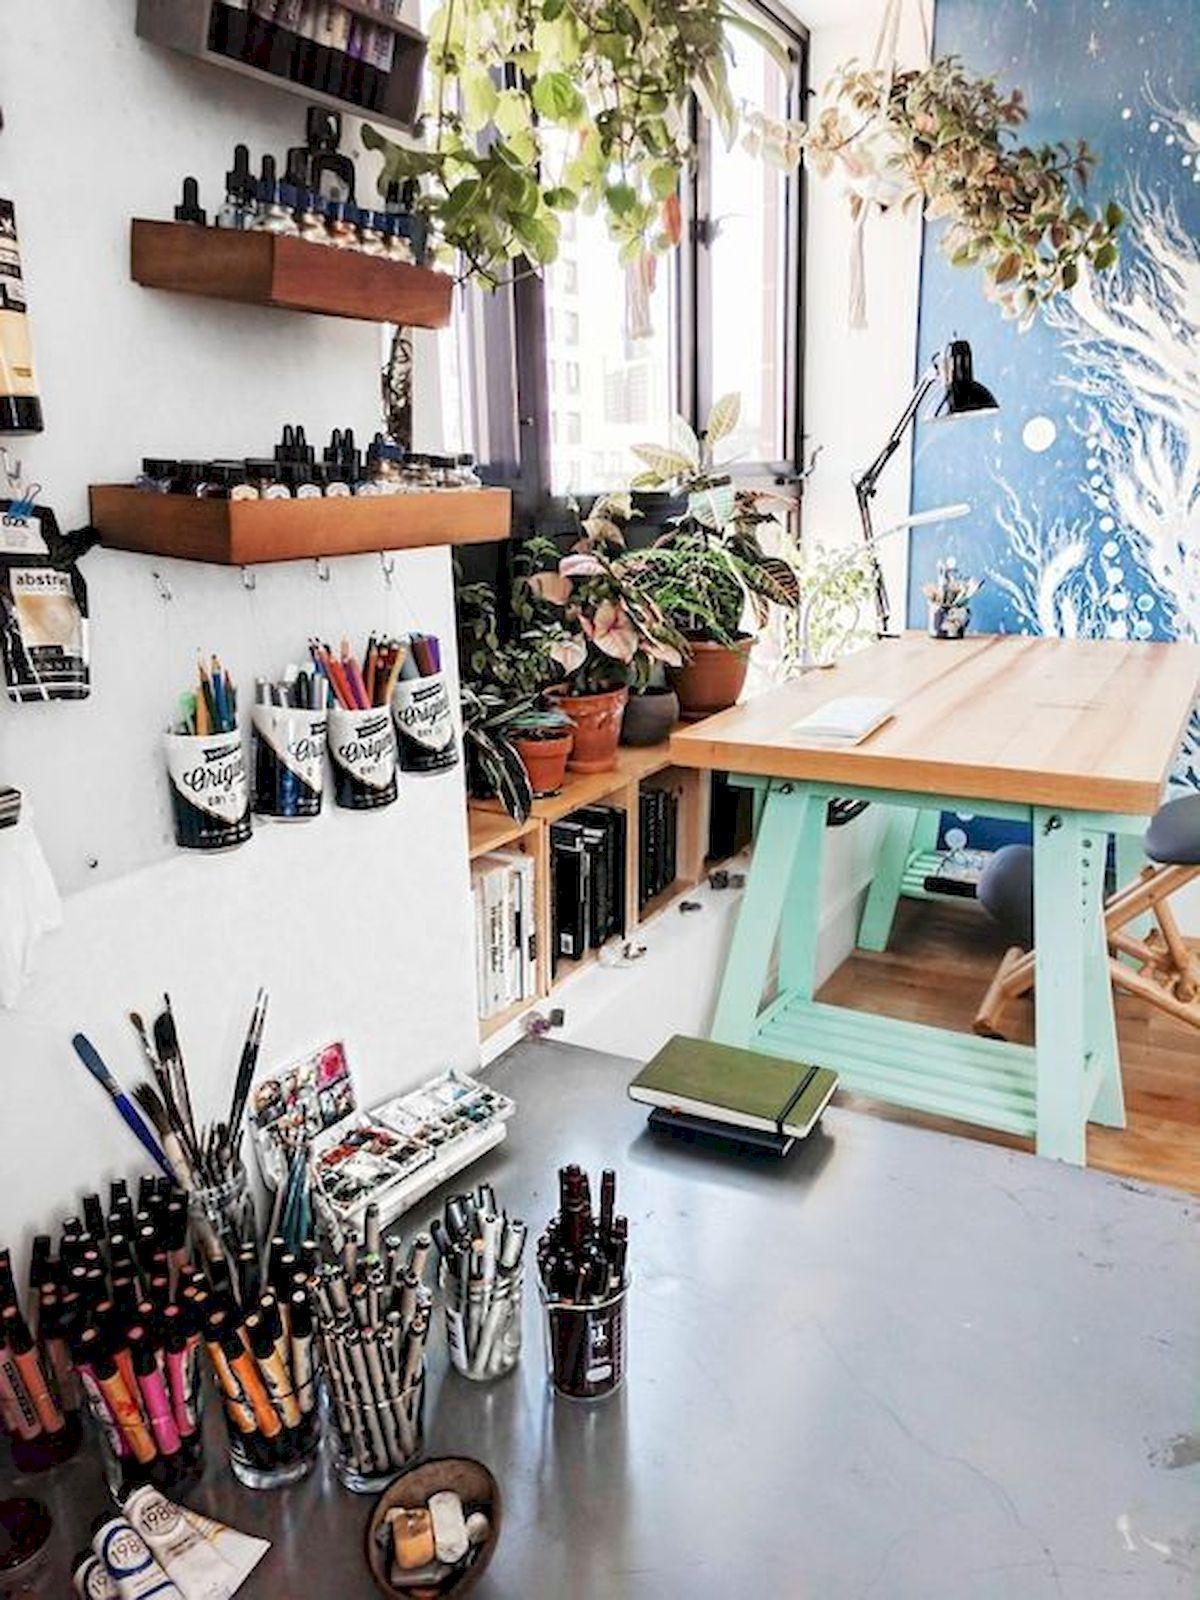 60 Most Popular Art Studio Organization Ideas And Decor 51